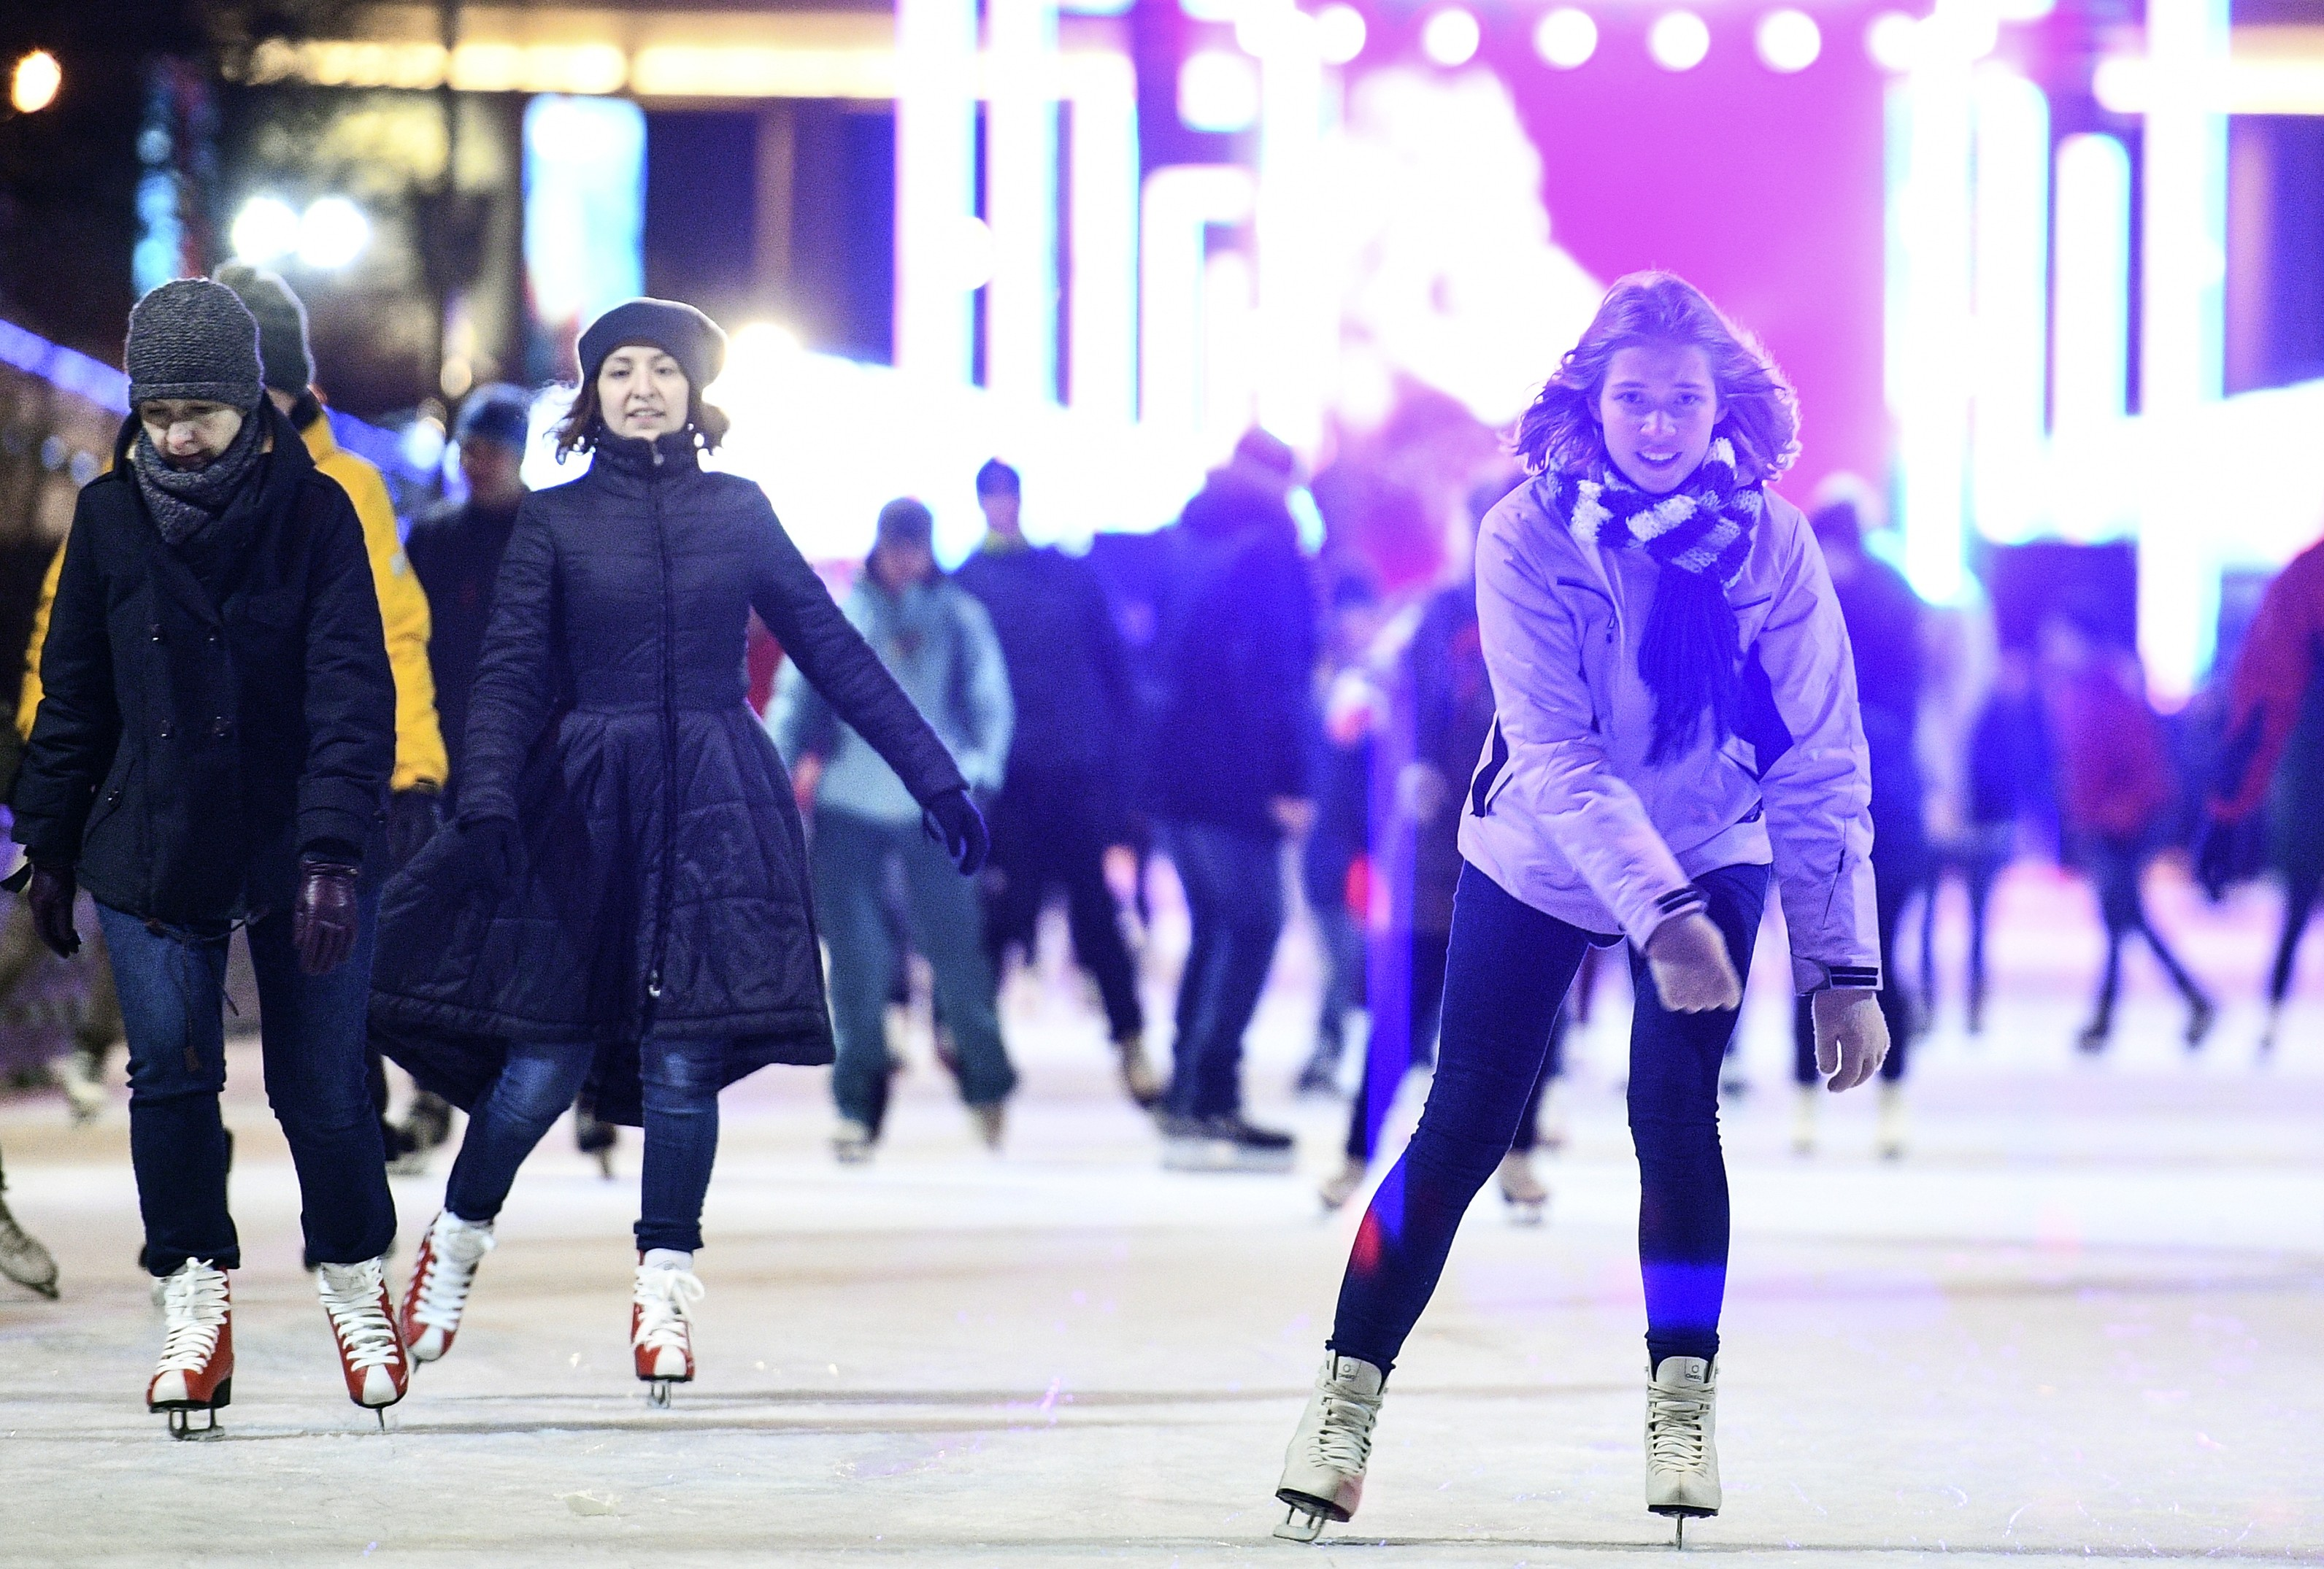 <p>Фото: &copy;РИА Новости/Рамиль Ситдиков</p>